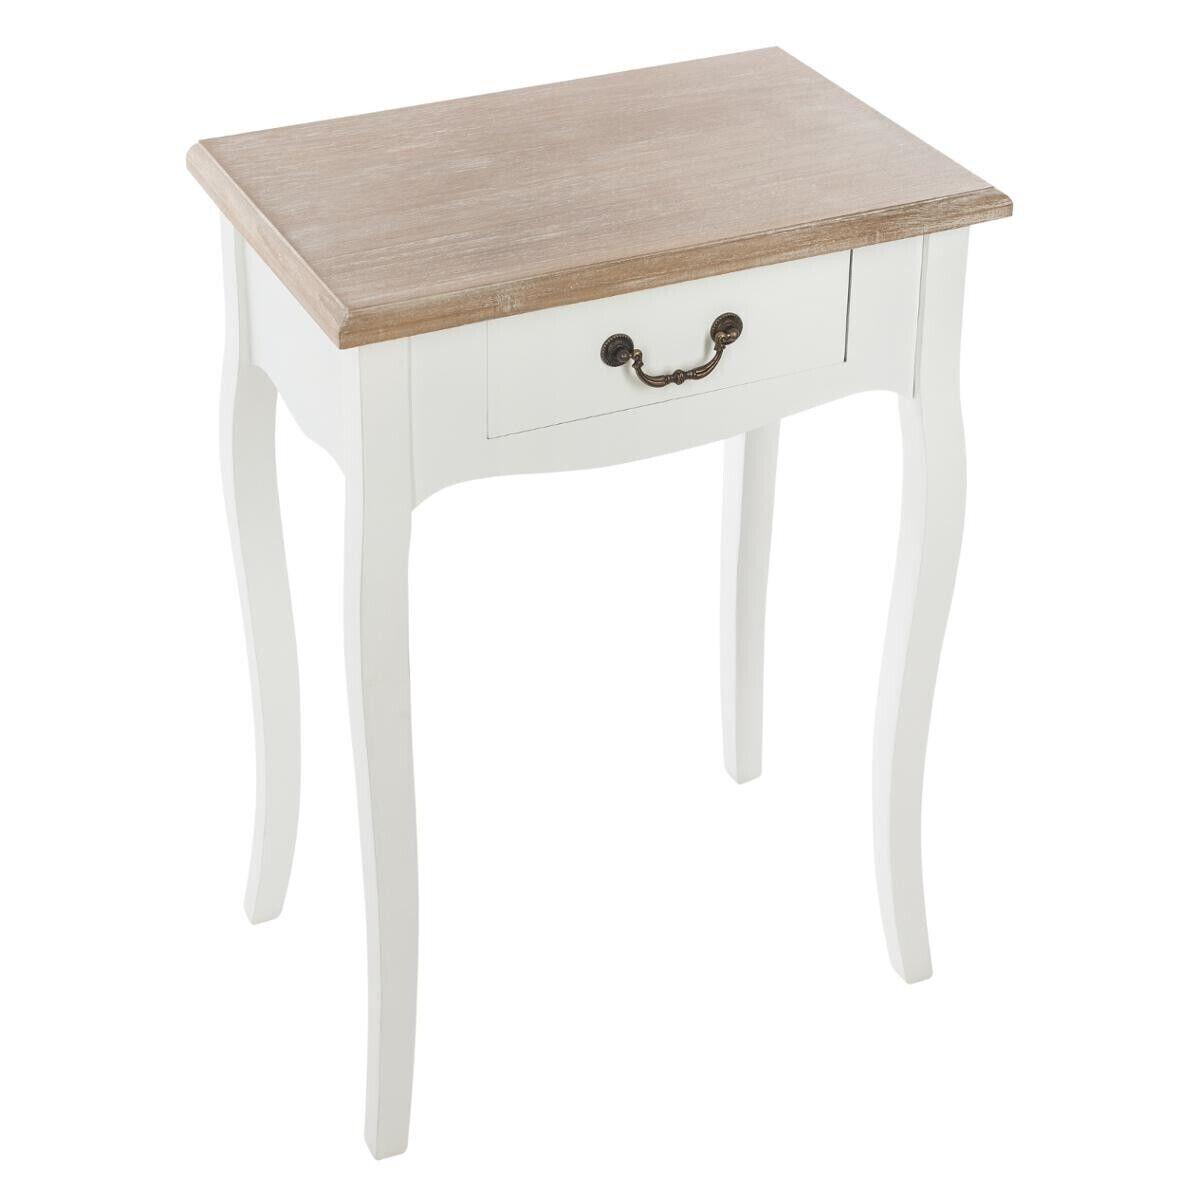 "Atmosphera Table de chevet ""Chrysa"" Blanche en bois naturel 1 tiroir"